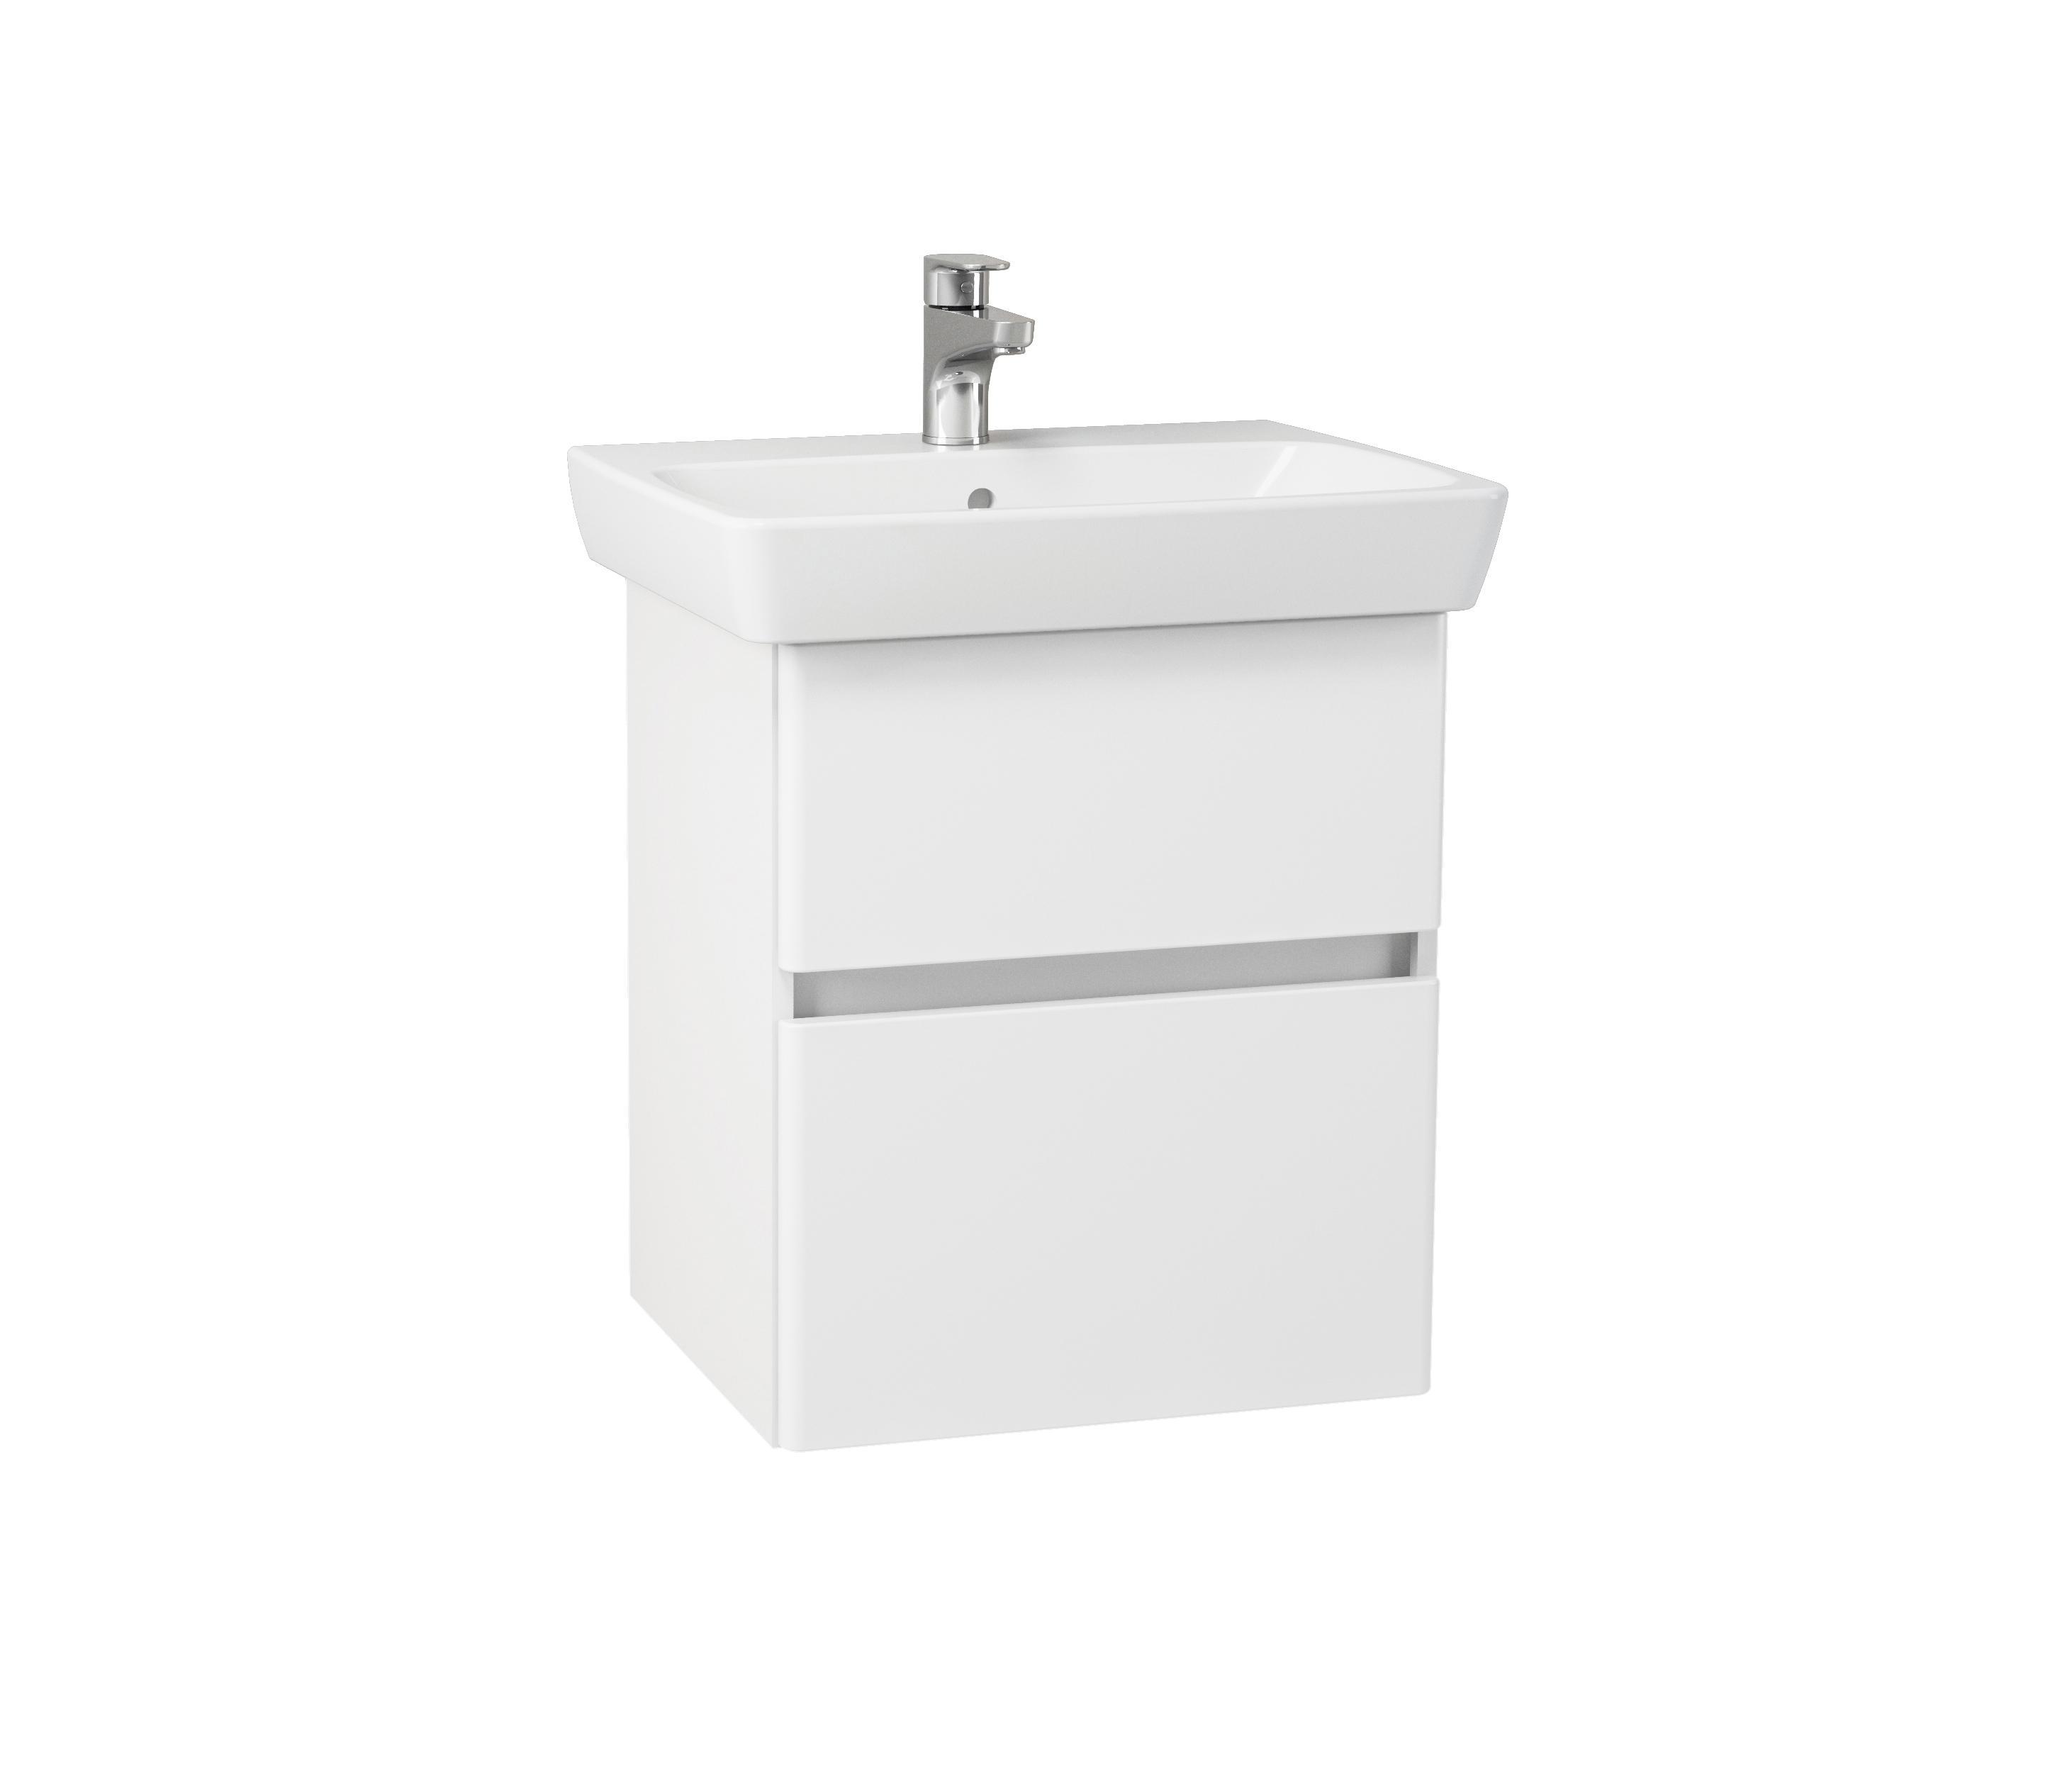 Metropole Vanity Unit By VitrA Bad | Wash Basins